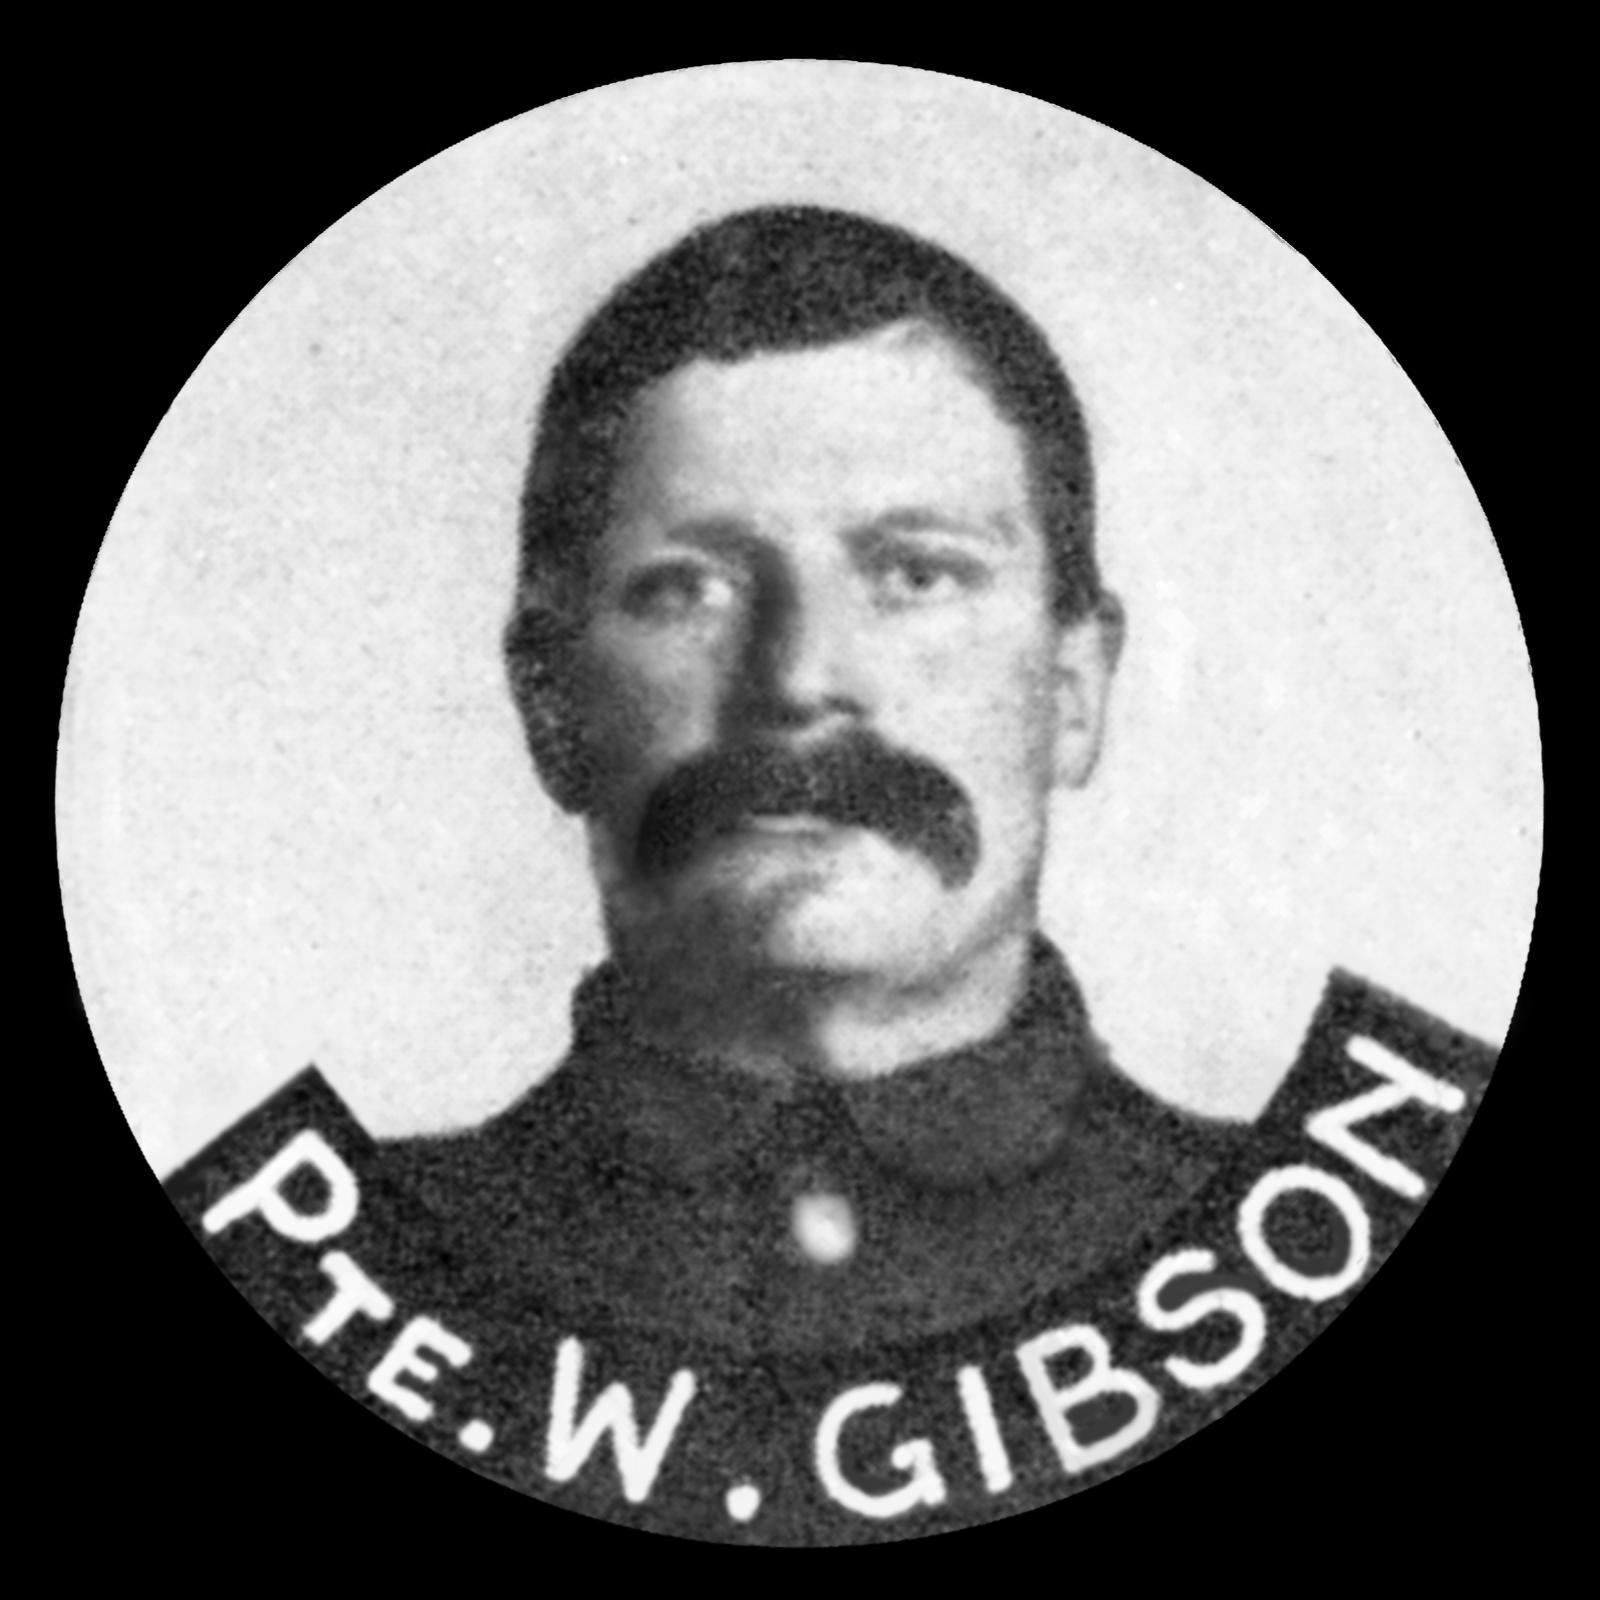 GIBSON Walter